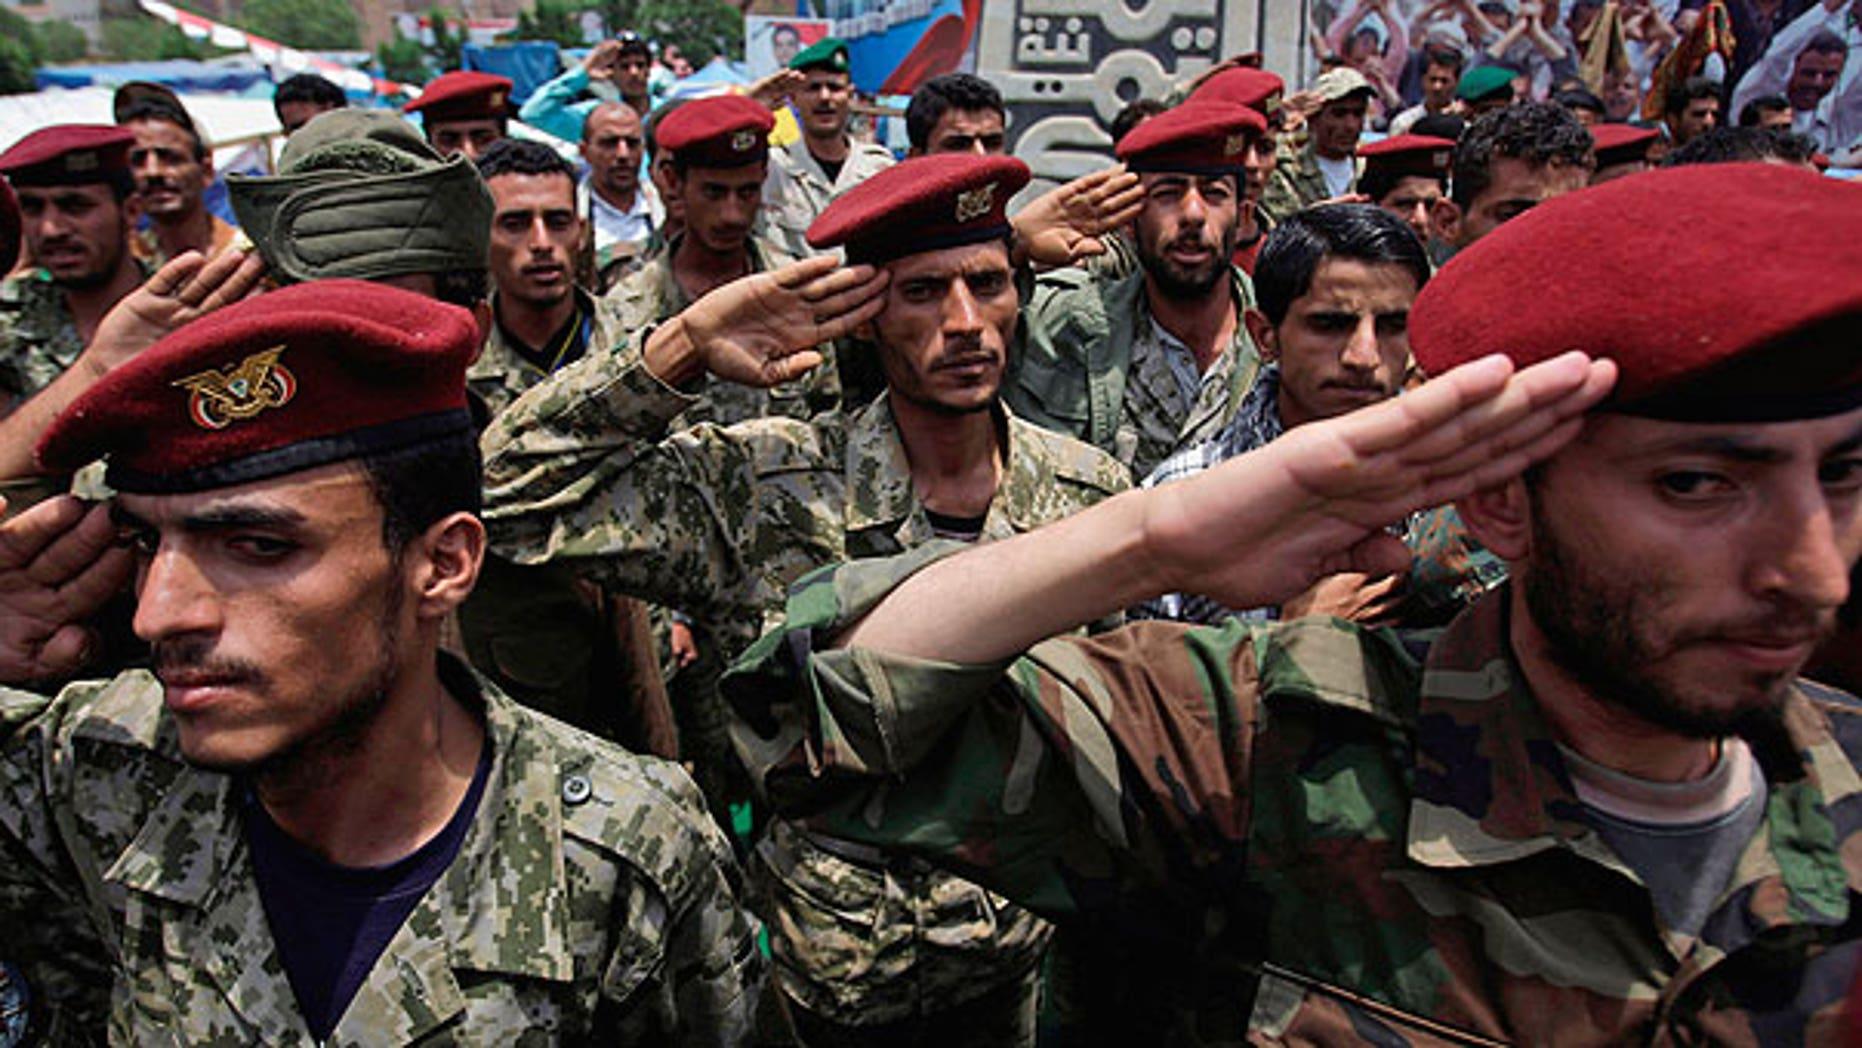 July 31: Defected soldiers salute during a protest demanding the resignation of Yemen's President Ali Abdullah Saleh in Sanaa, Yemen.